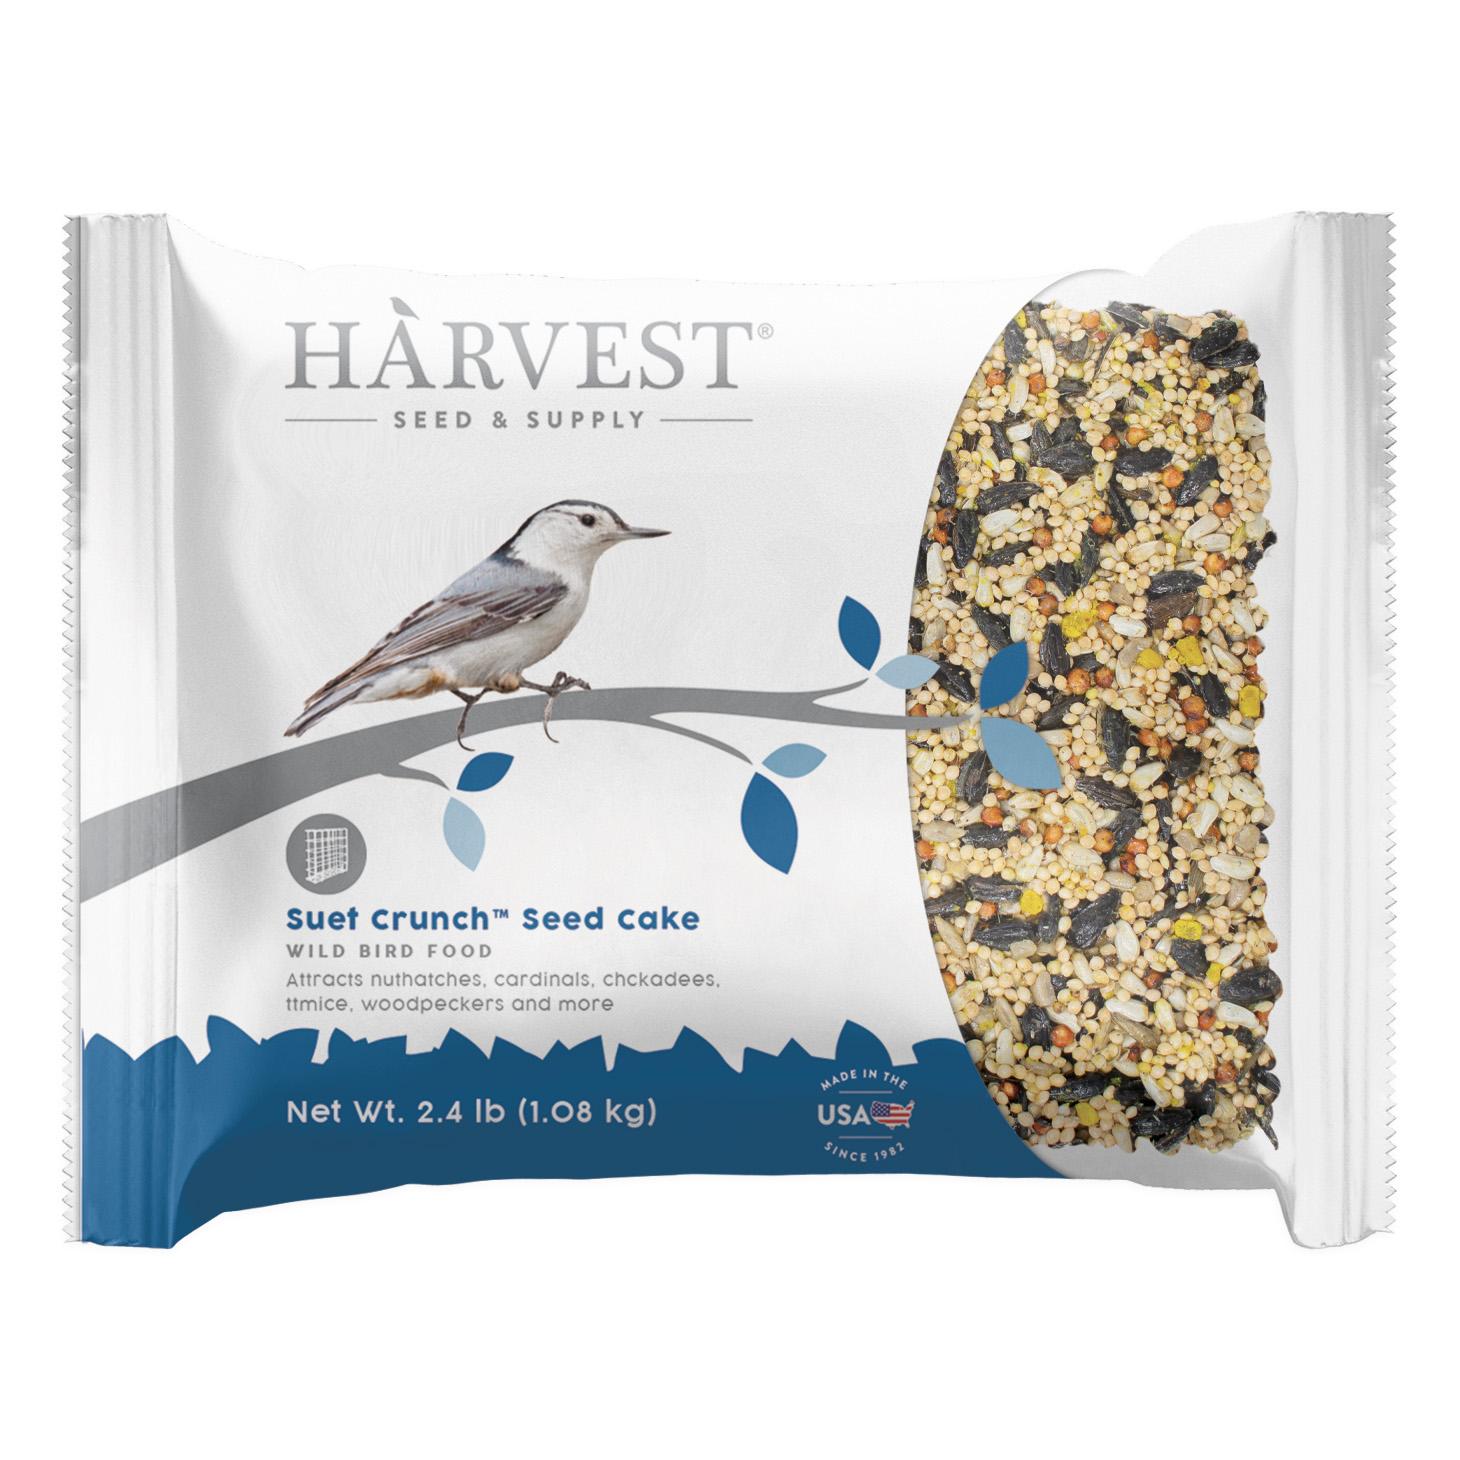 Suet Crunch™ Seed Cake Image